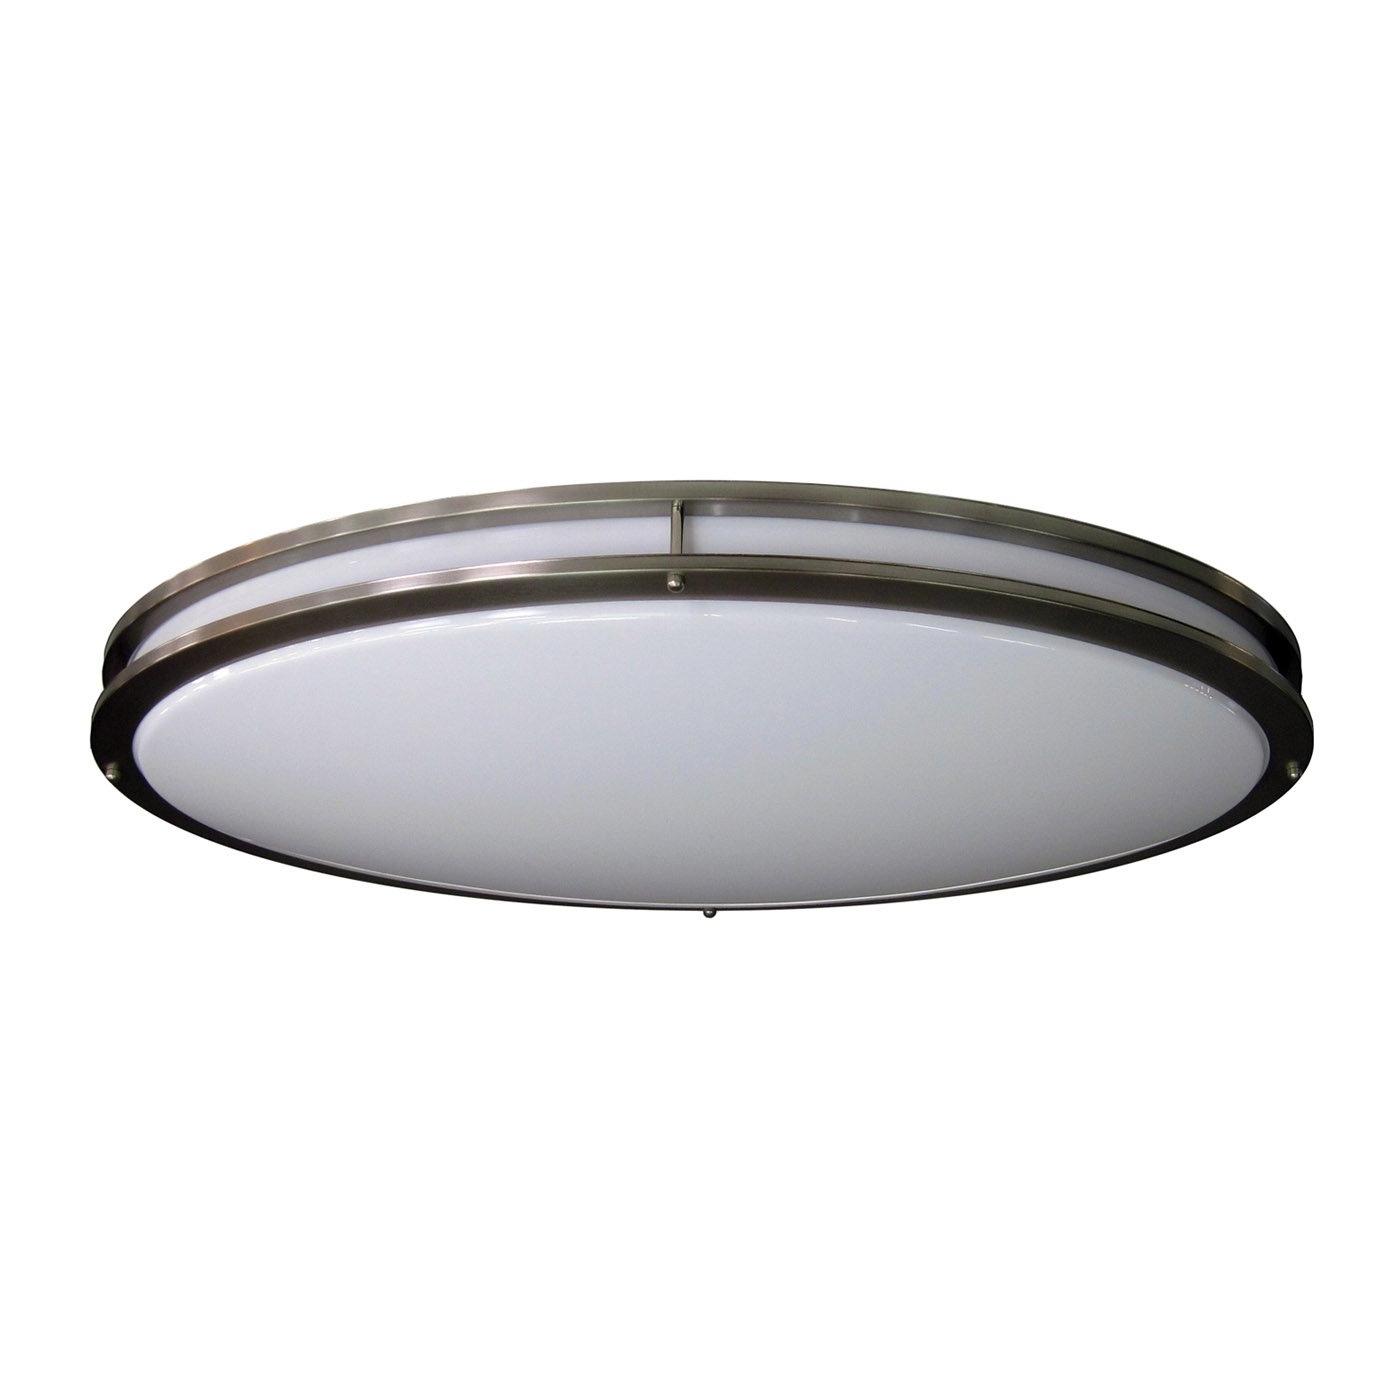 Most Recently Released Outdoor Ceiling Mount Led Lights In Led Light Design: Affordable Led Flush Mount Ceiling Lights Flush (View 11 of 20)